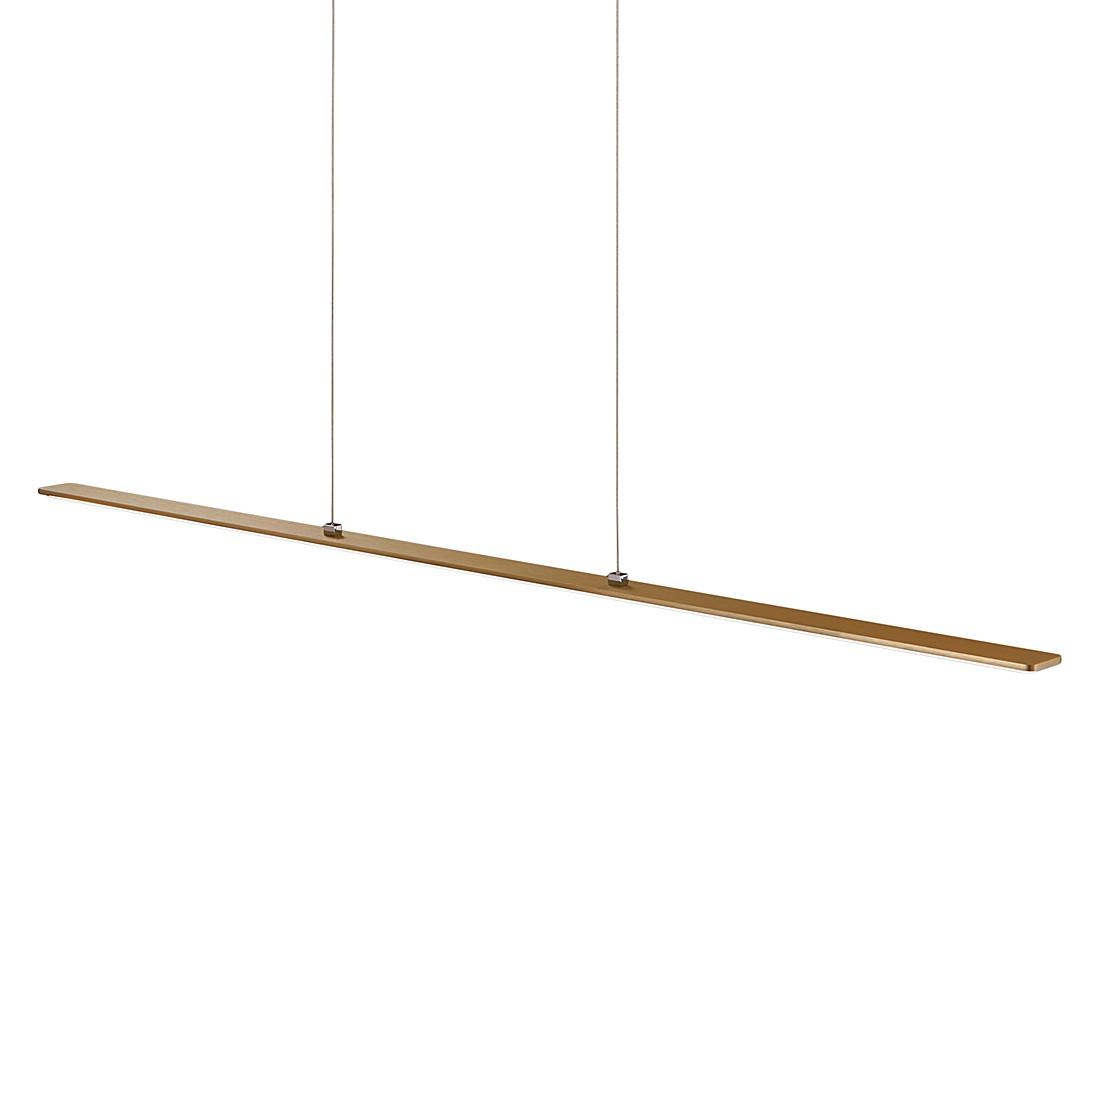 pendelleuchte lexx metall gold helestra a kaufen. Black Bedroom Furniture Sets. Home Design Ideas